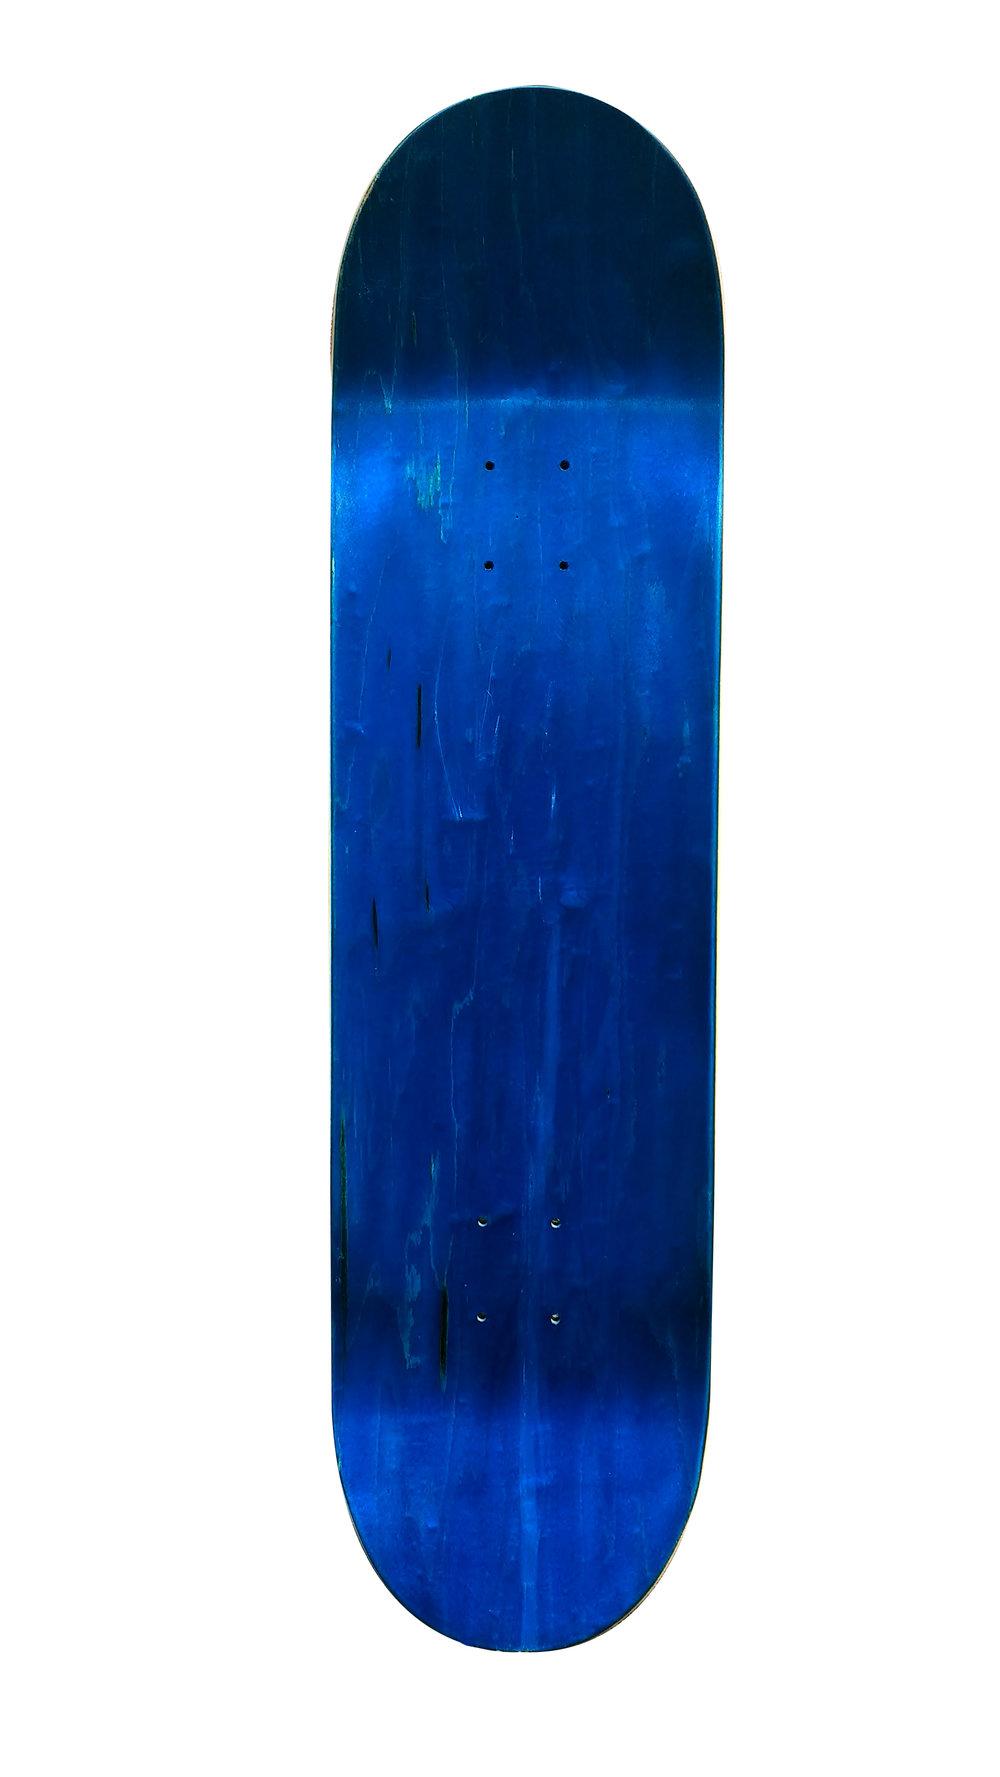 Promo Skateboard Decks